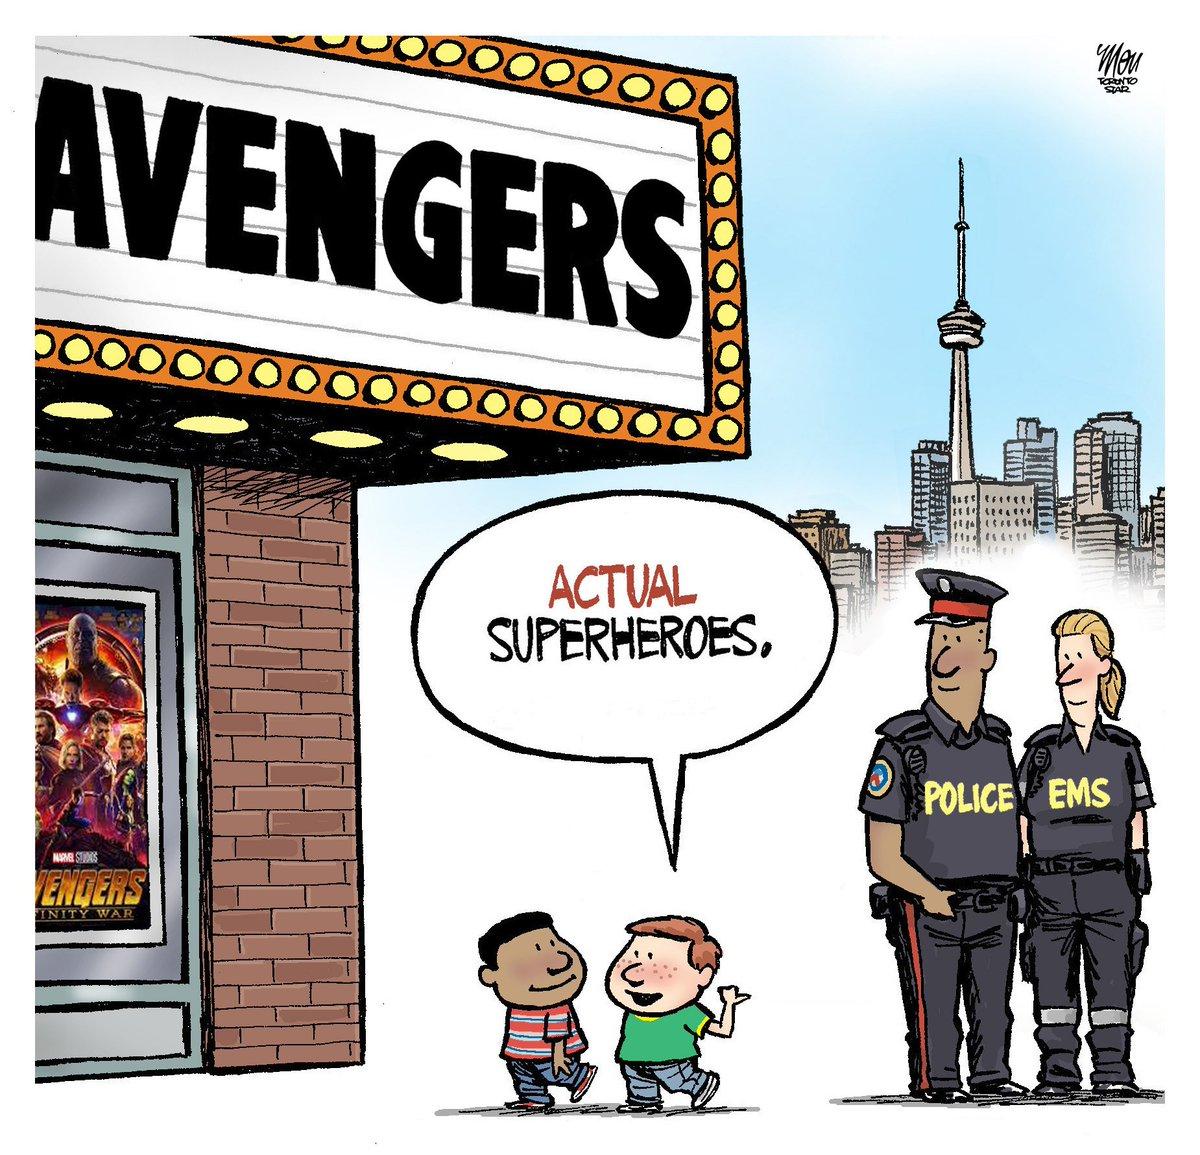 Here's Thursday's #TorontoStrong cartoon in @TorontoStar